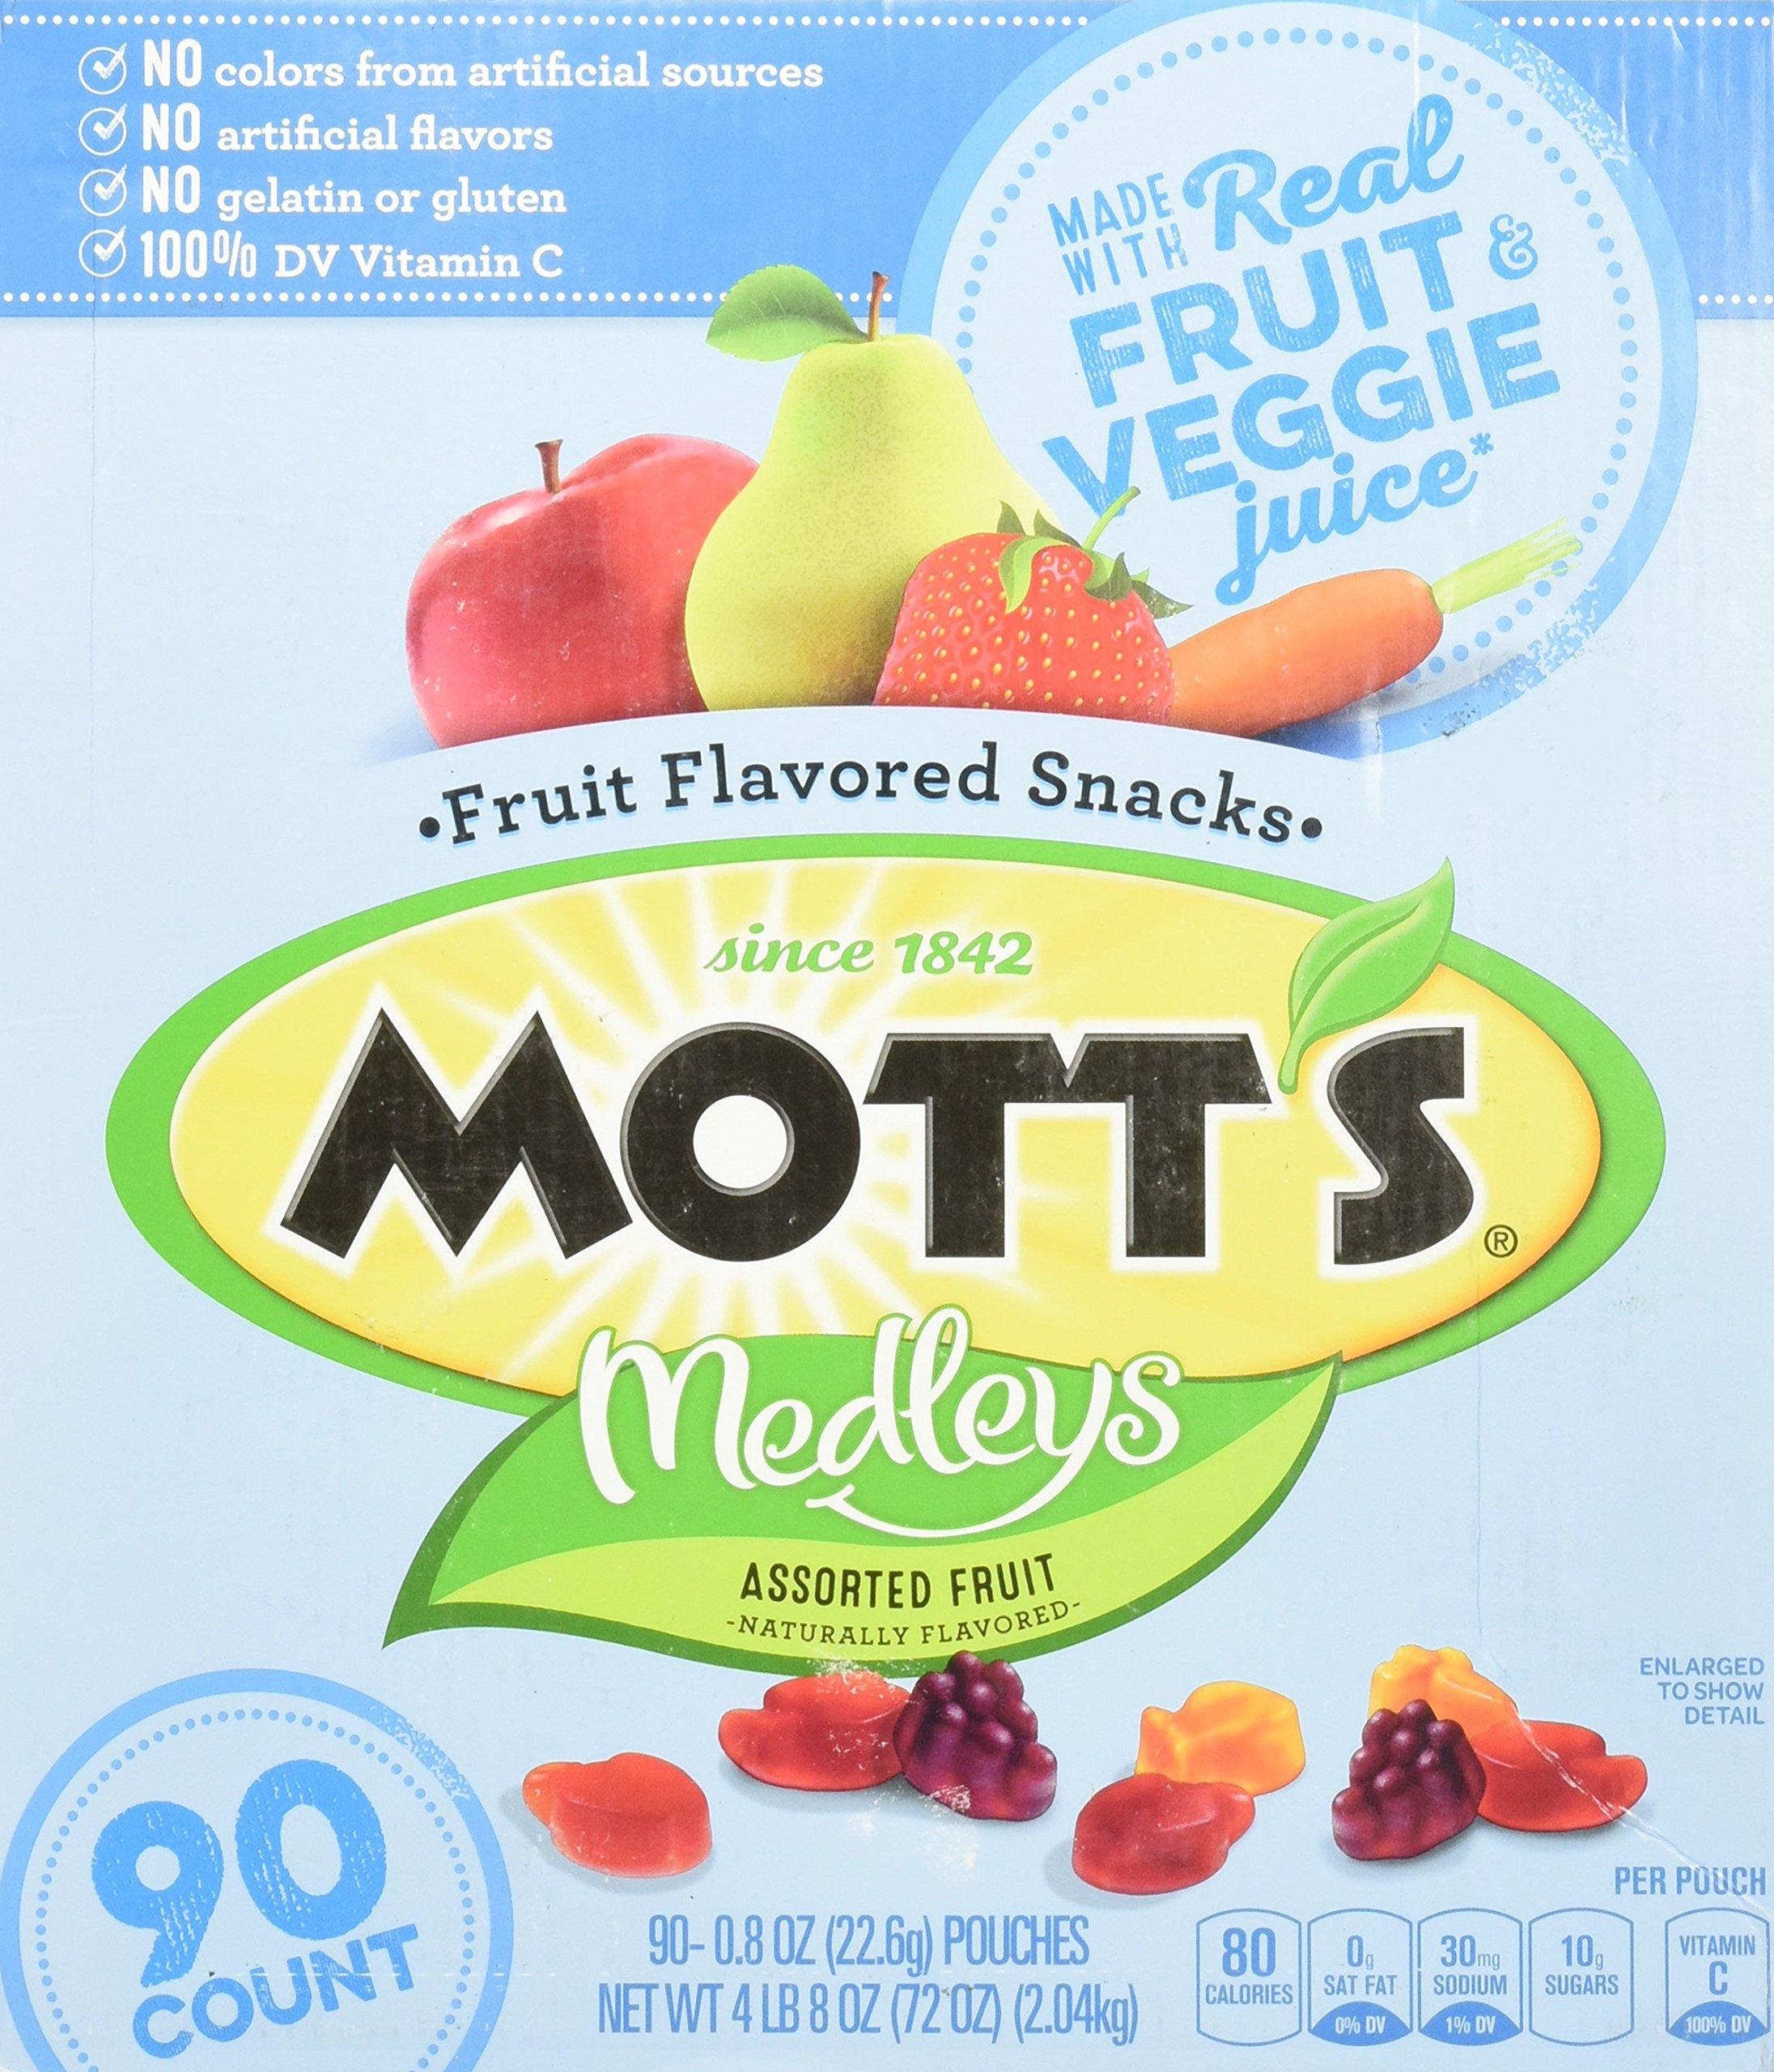 Mott's Medley Assorted Fruit Flavored Snacks (90 ct.)